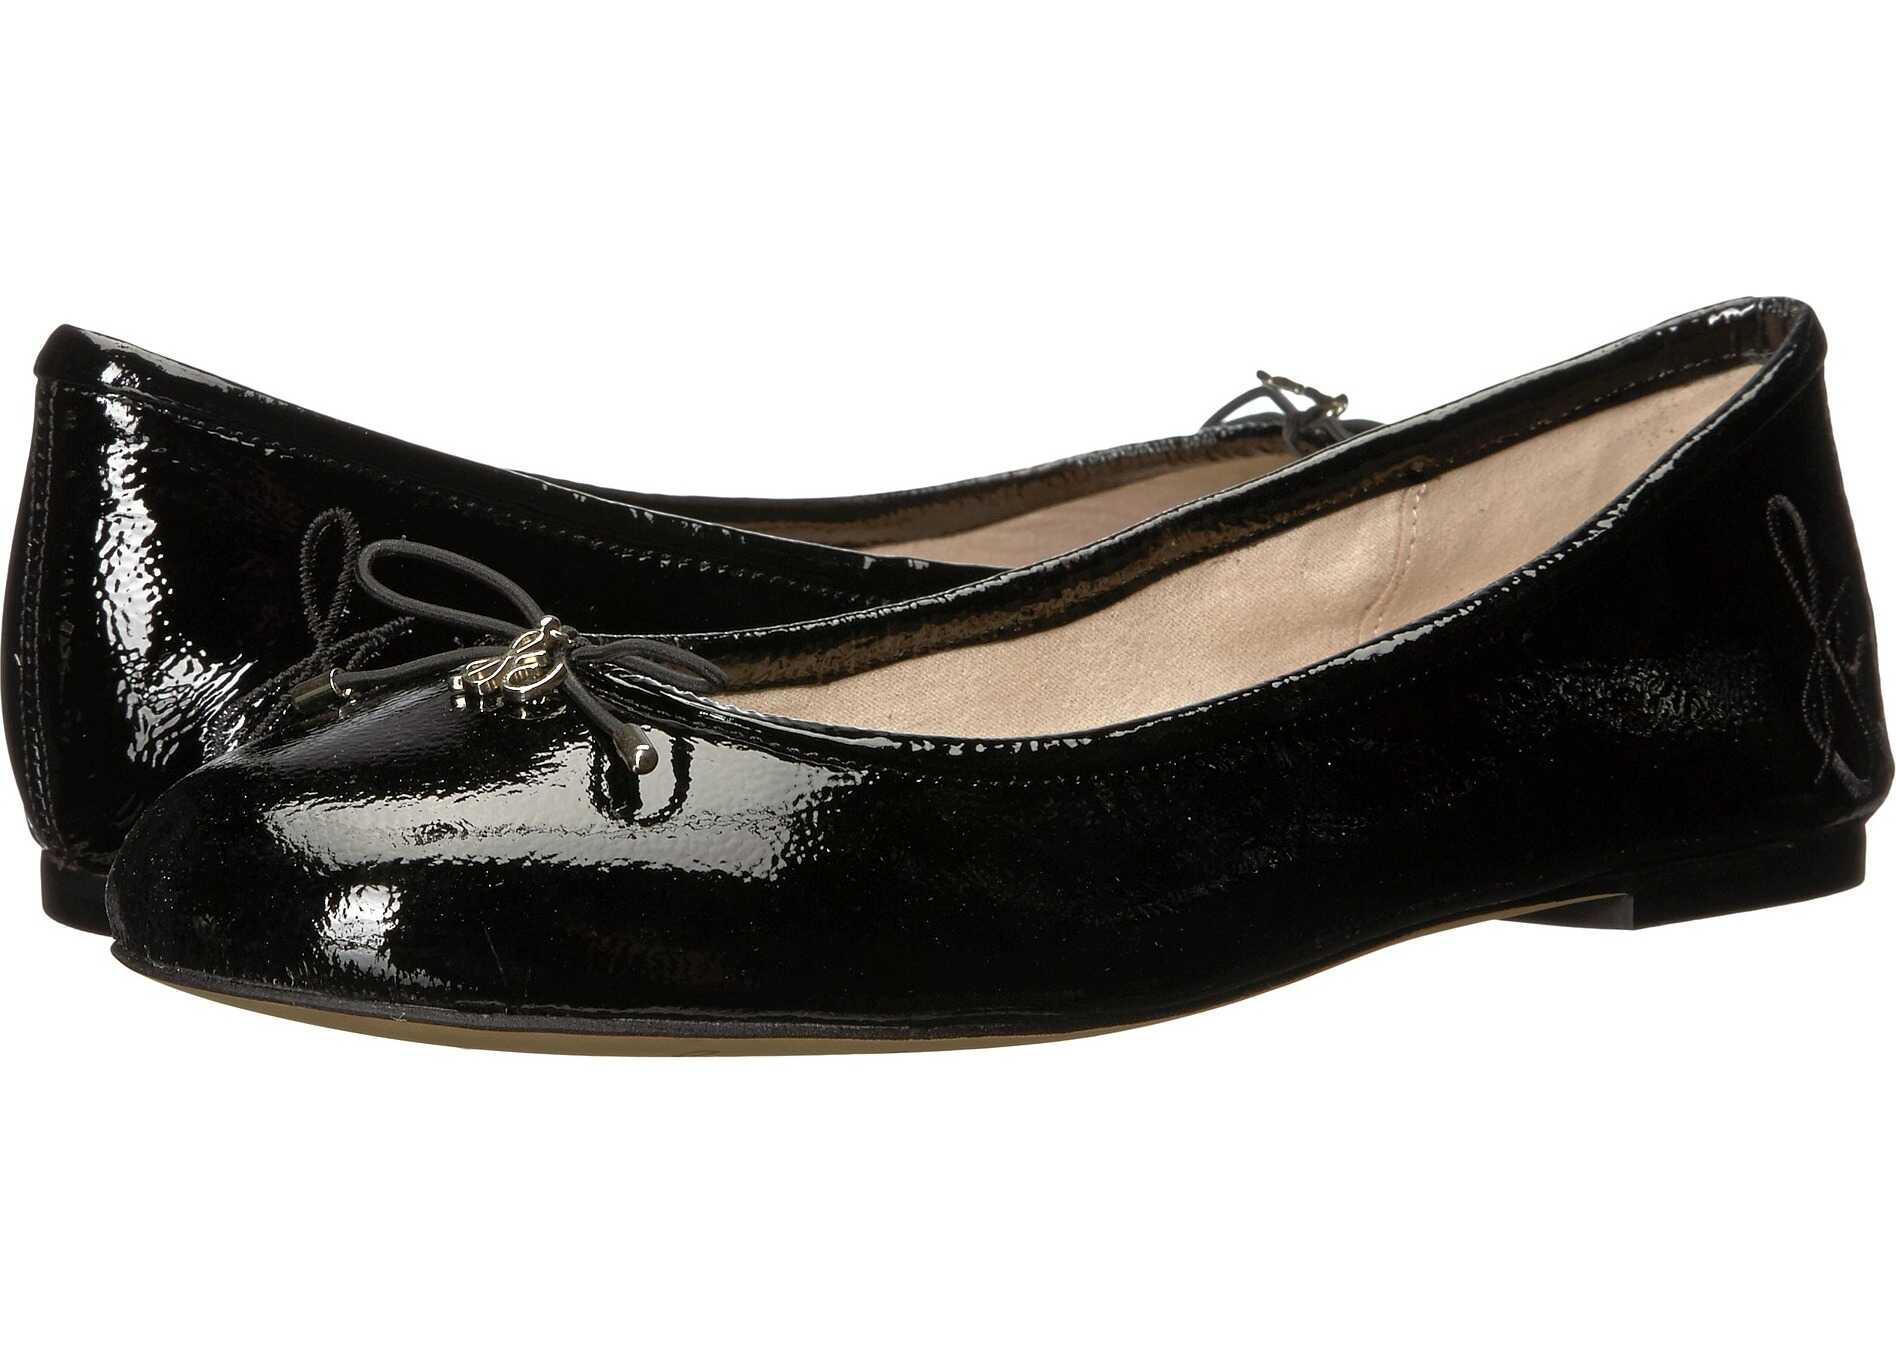 Sam Edelman Felicia Black Goat Crinkle Patent Leather